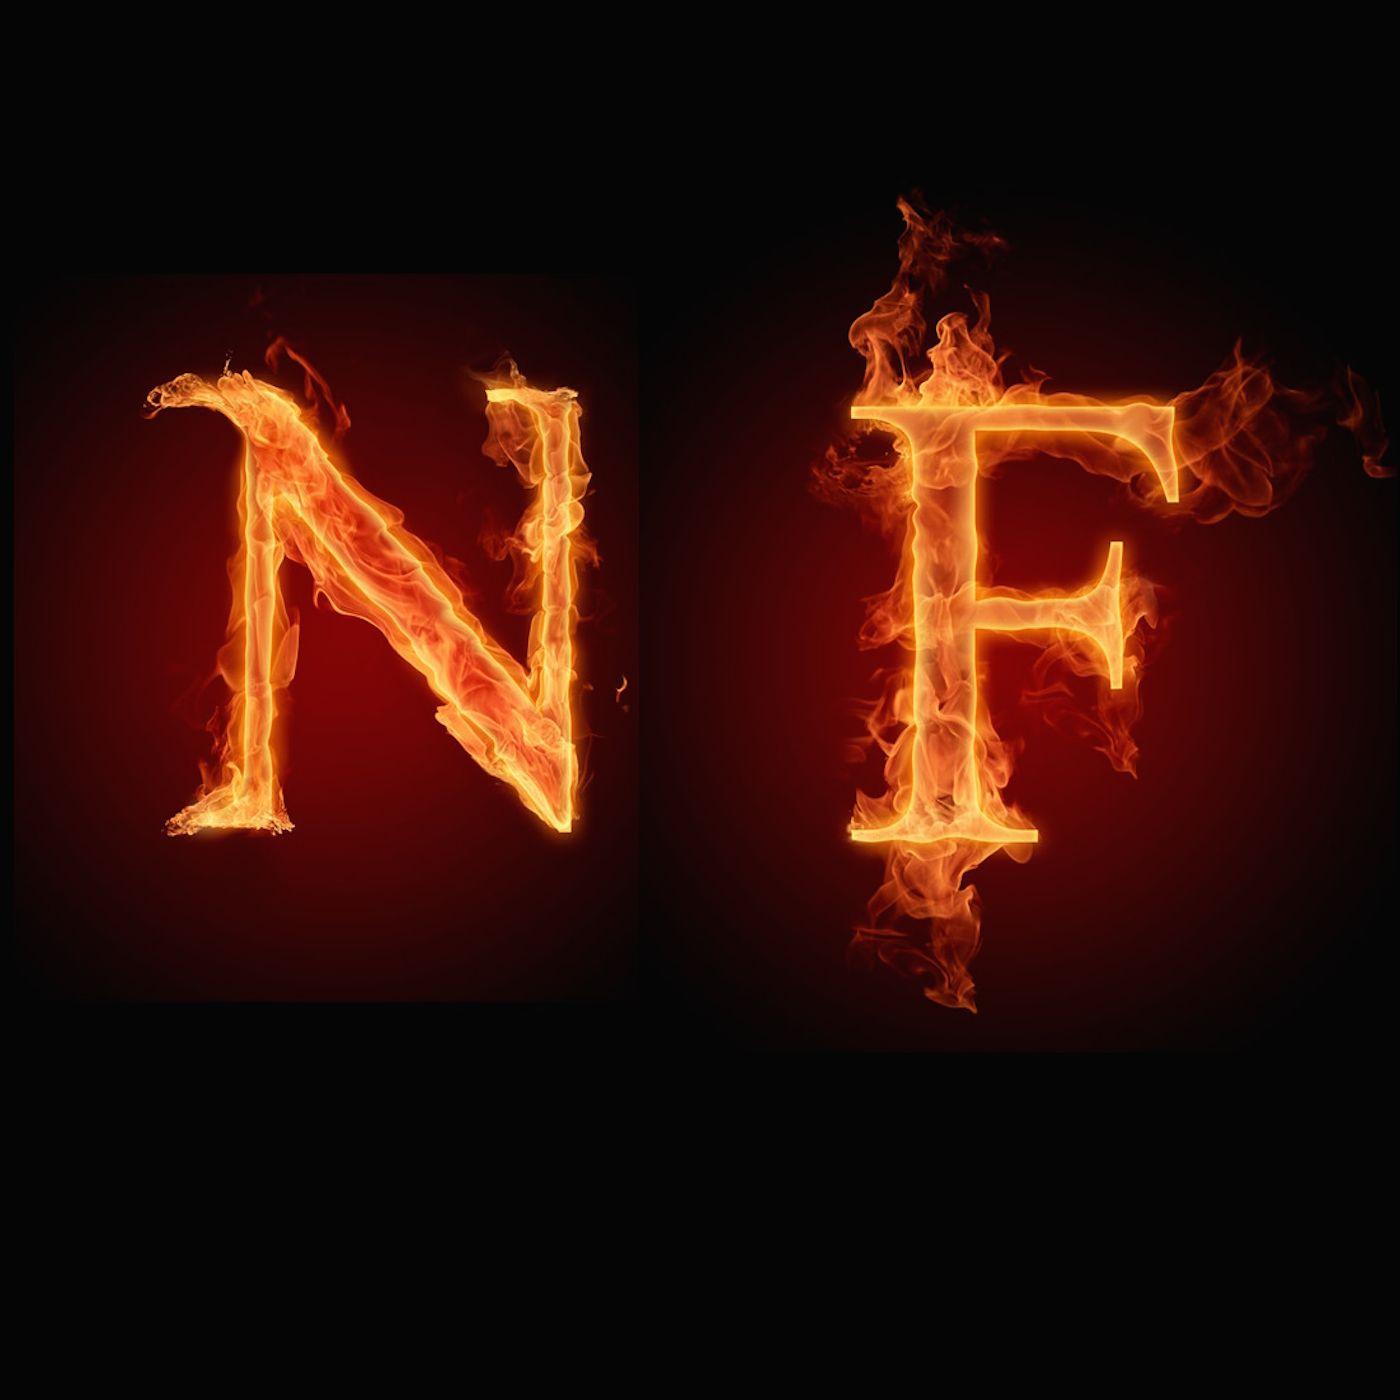 Nerdfire